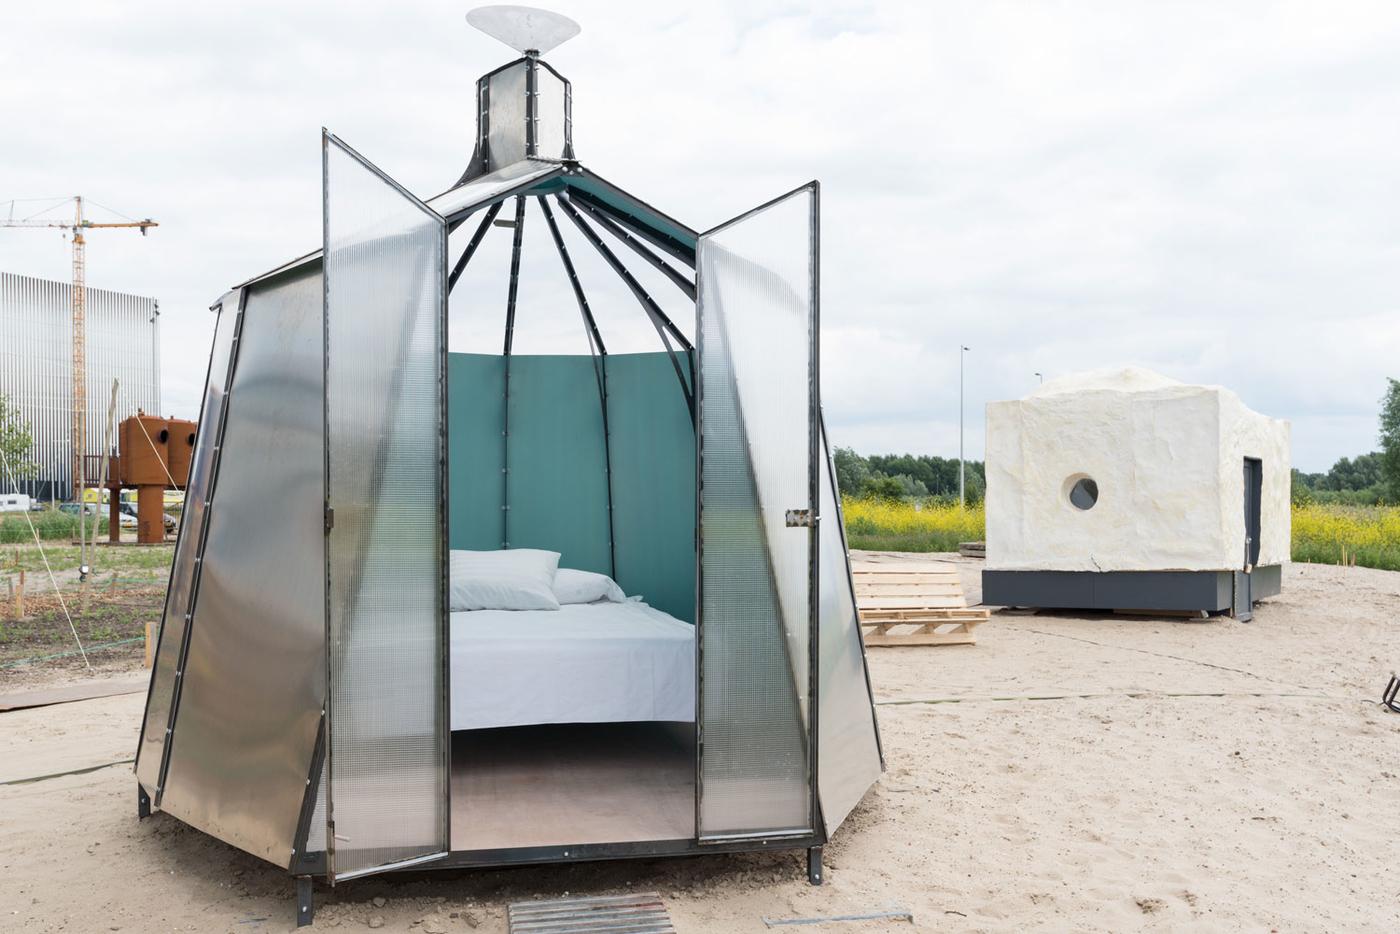 csm_Jeroen-Staats_Urban-Campsite-Amsterdam_13_6c121e0045